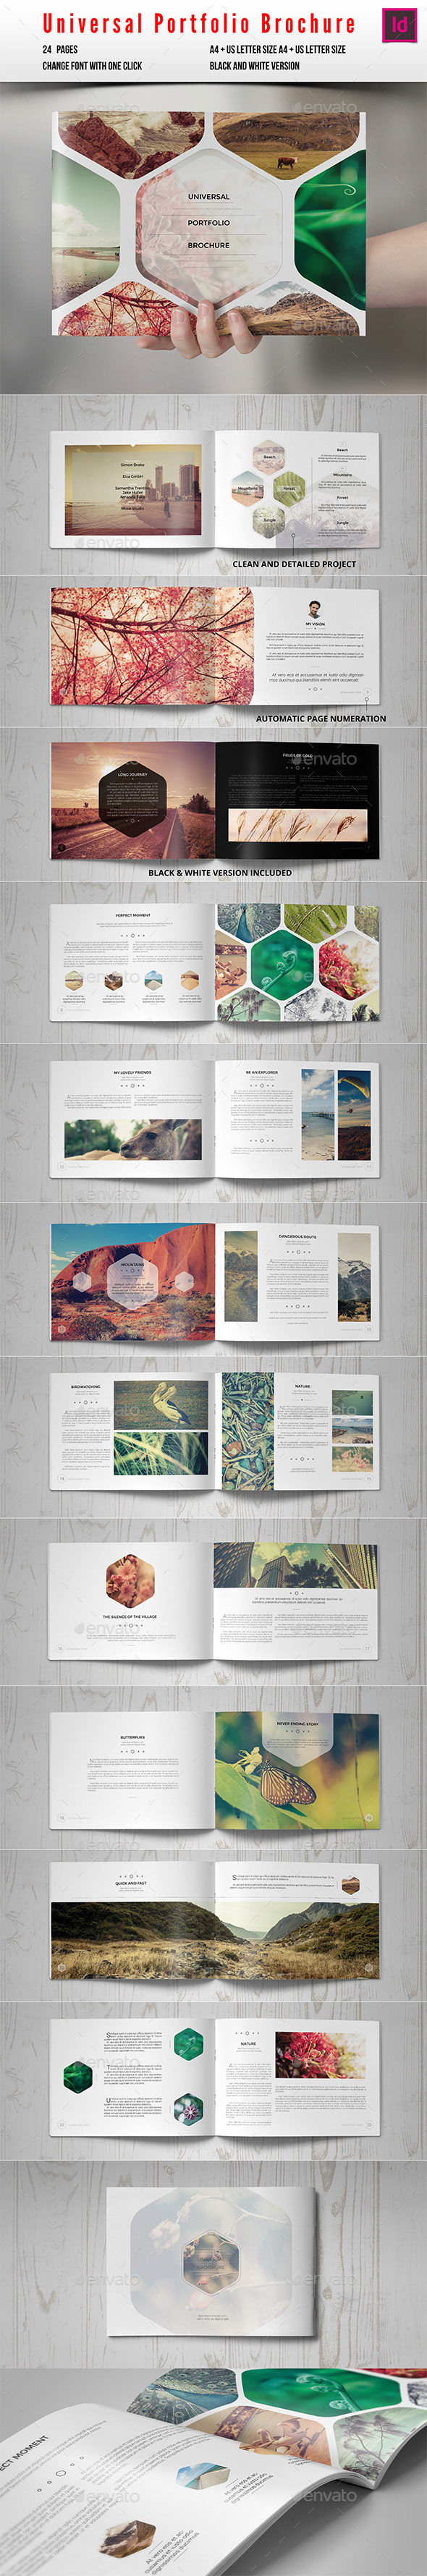 GraphicRiver Universal Portfolio Brochure Catalog 10164031